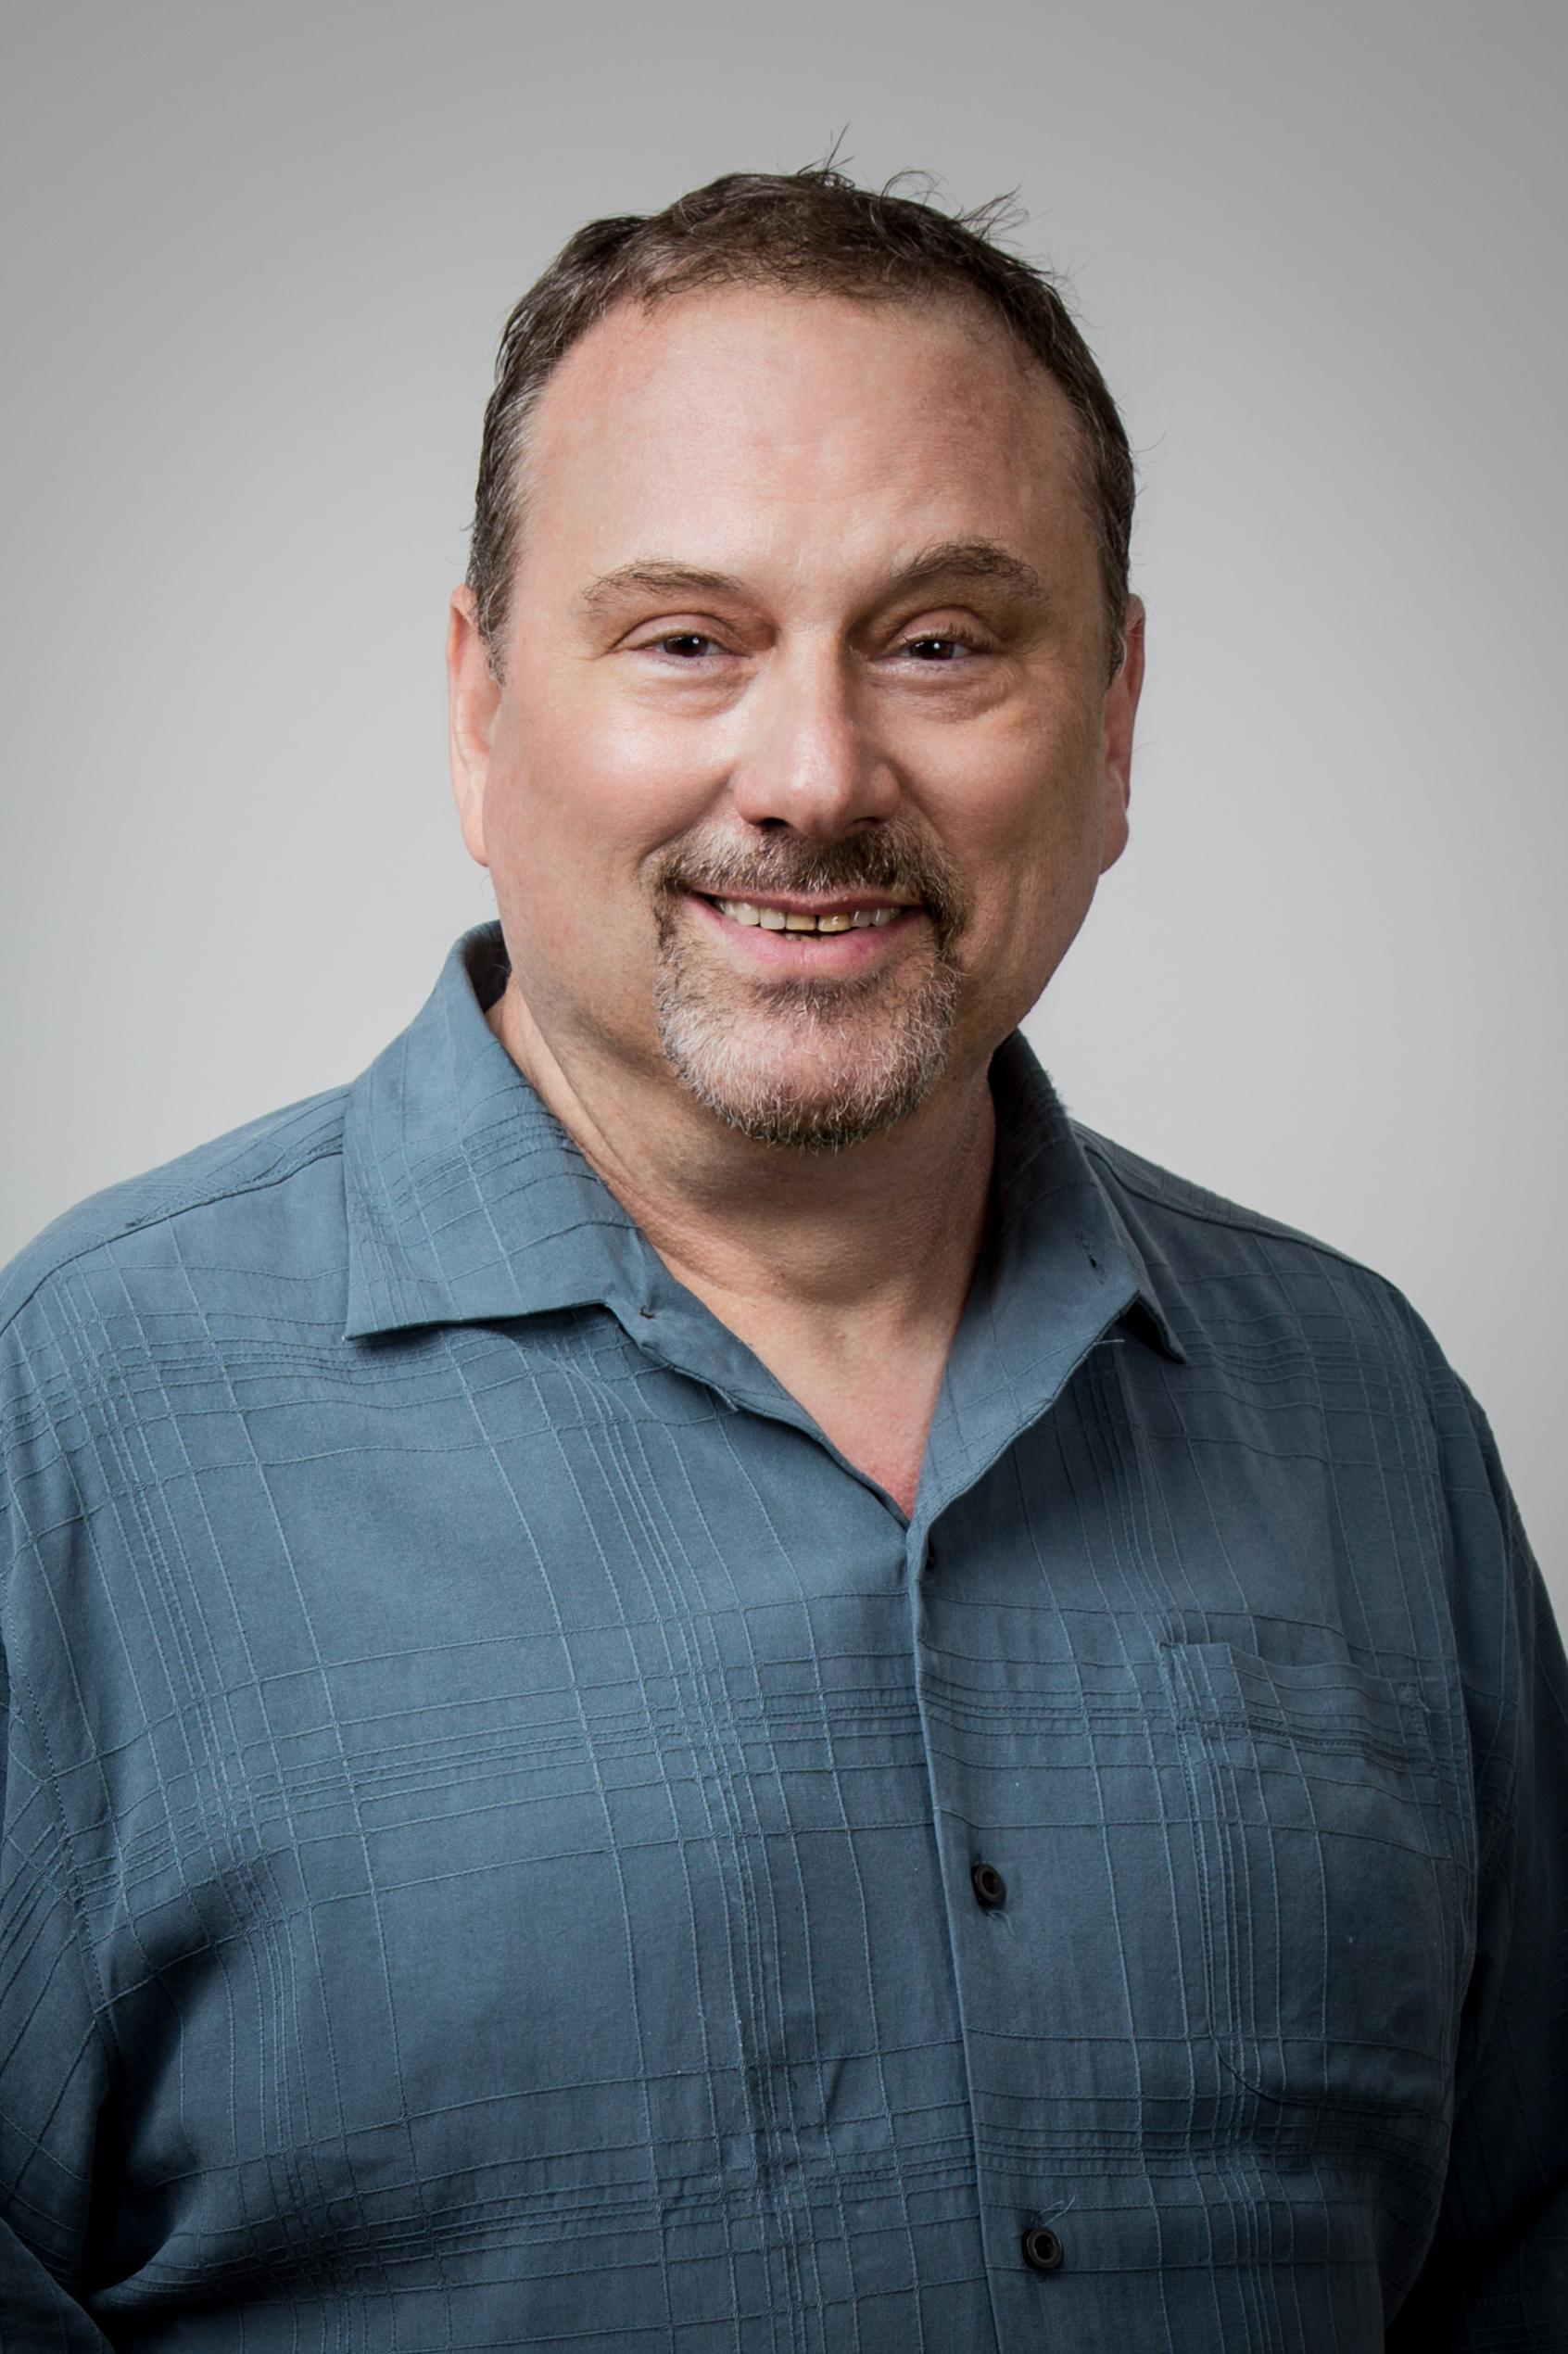 Craig Hobbs Portrait